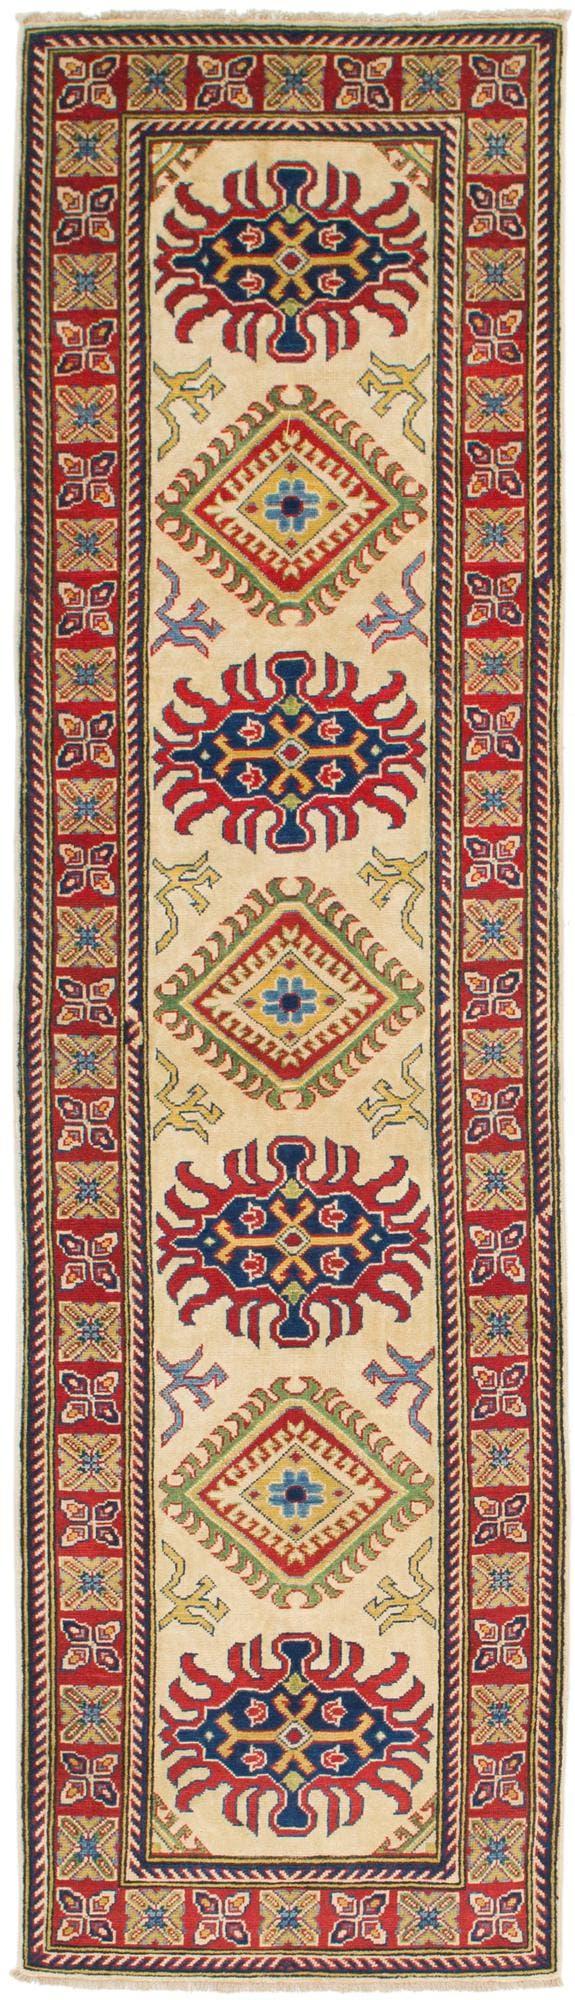 2' 8 x 9' 9 Kazak Runner Rug main image